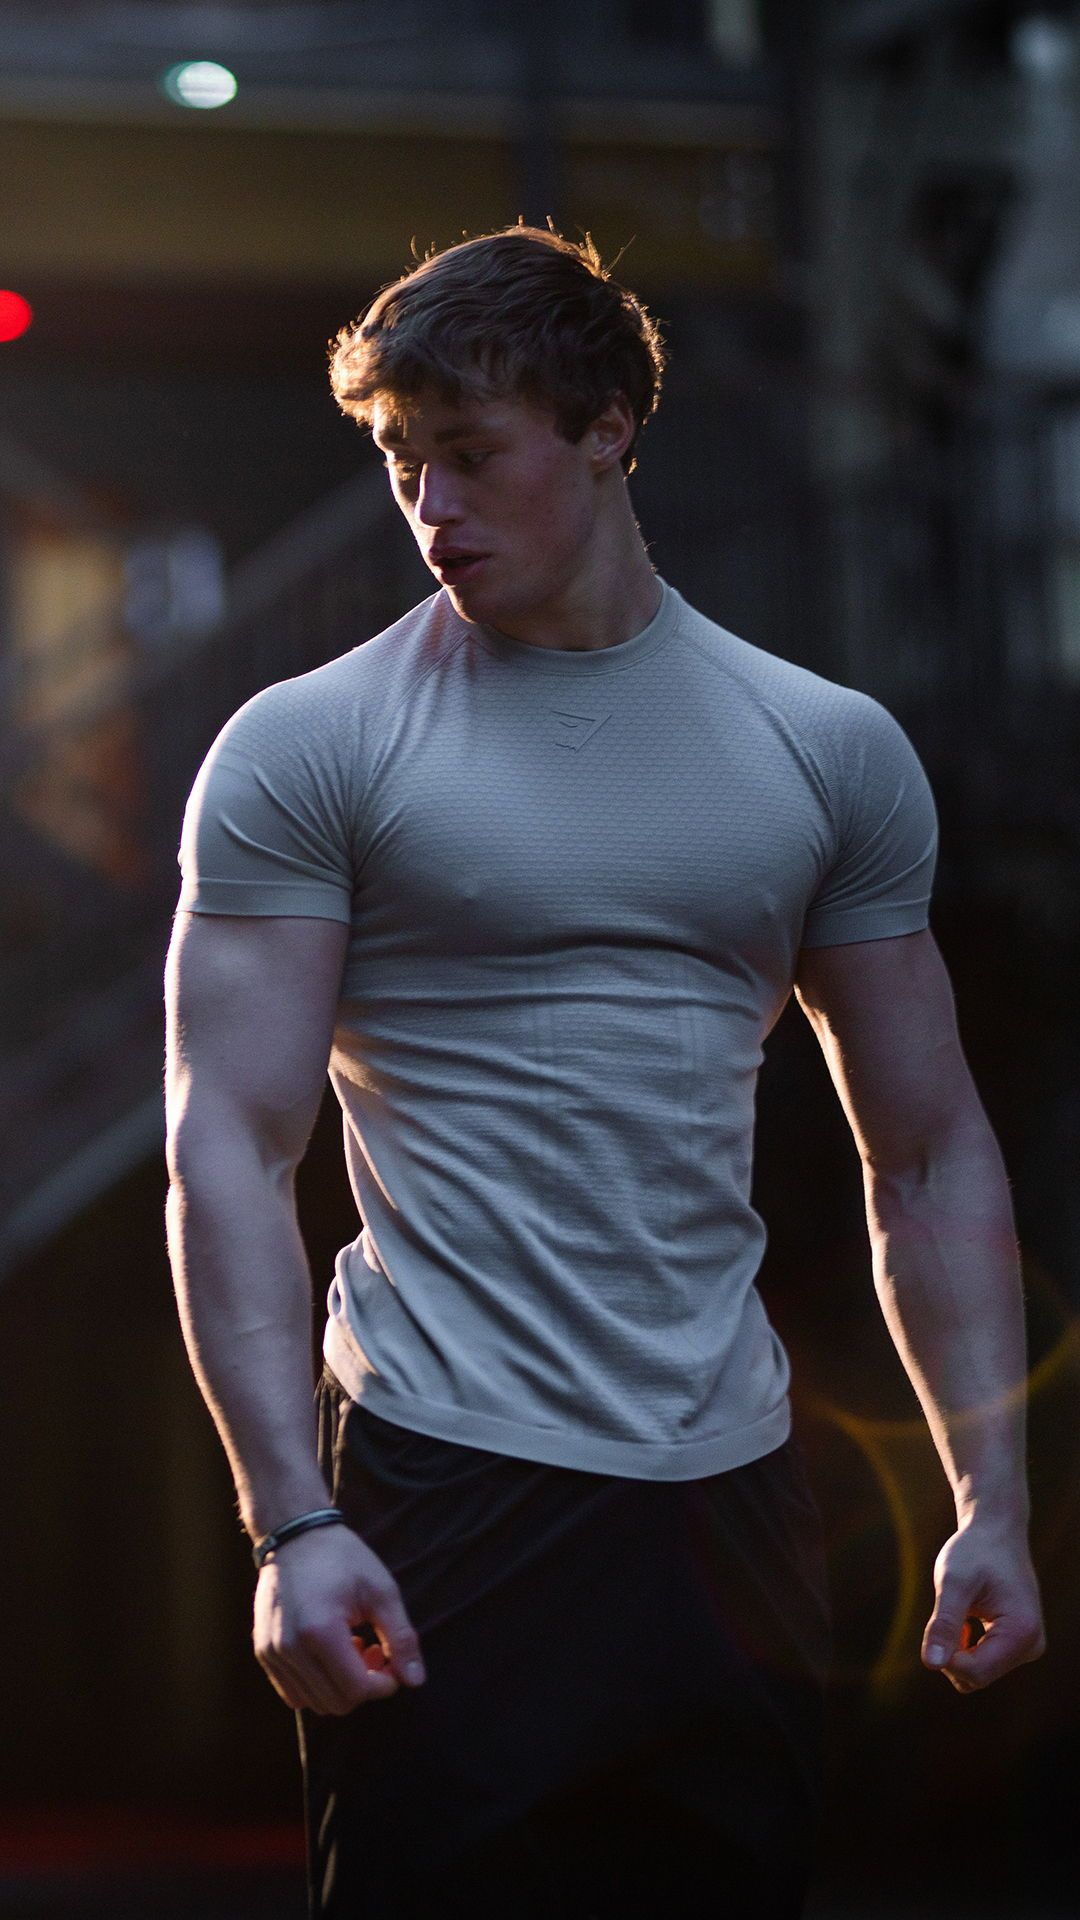 9b770d8a55b1 Gymshark  Athlete  Workout  Sports  DavidLaid